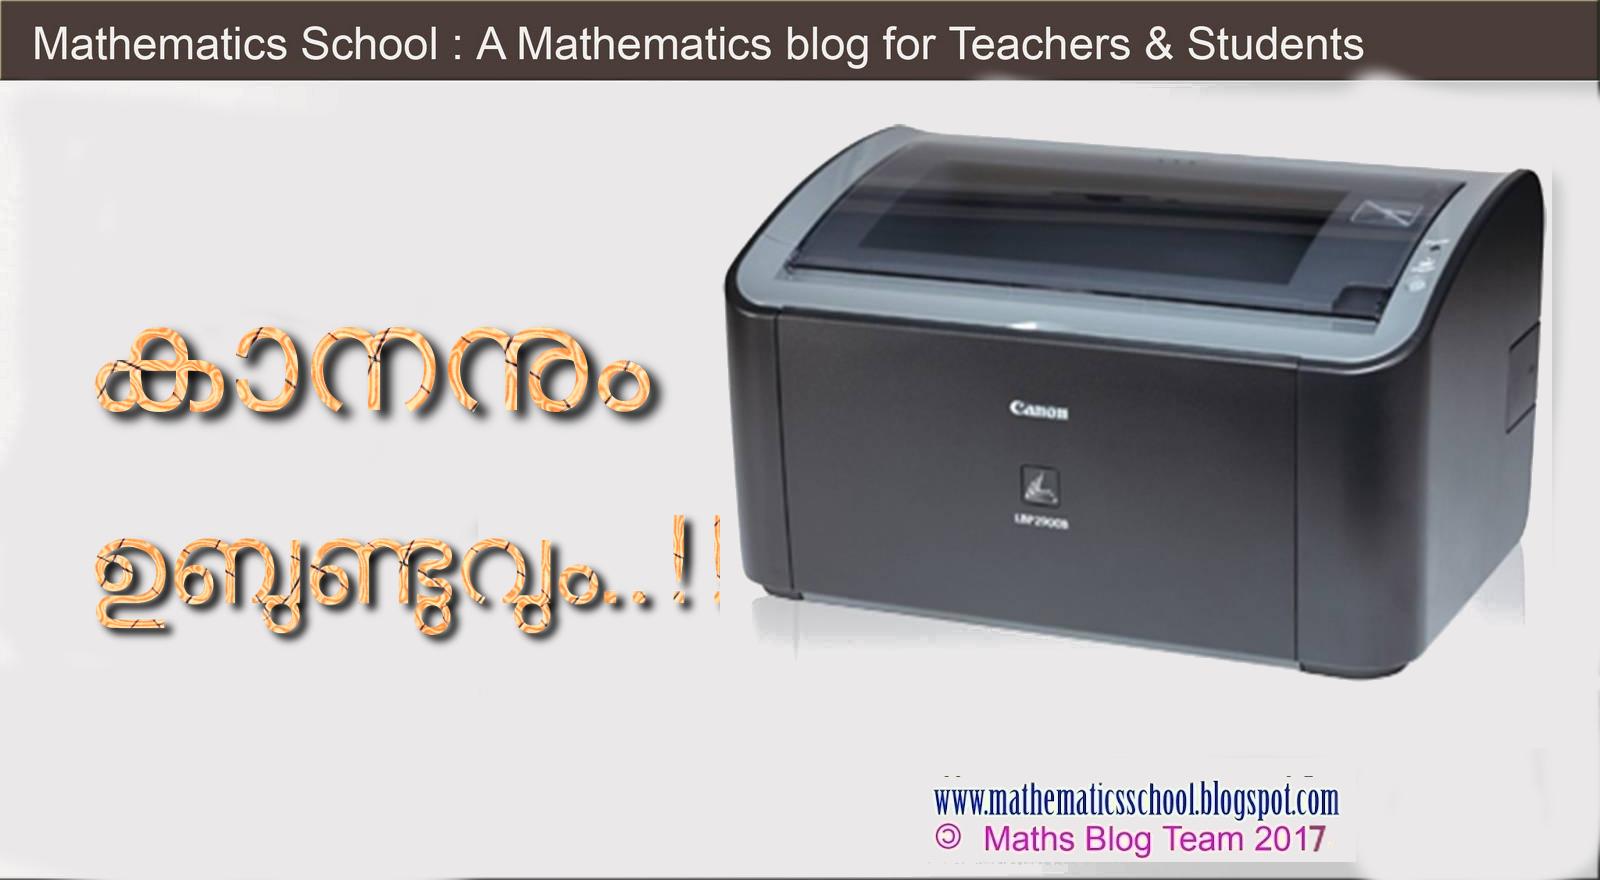 www.mathsblog.in  Maths Blog for School Teachers & Students ...